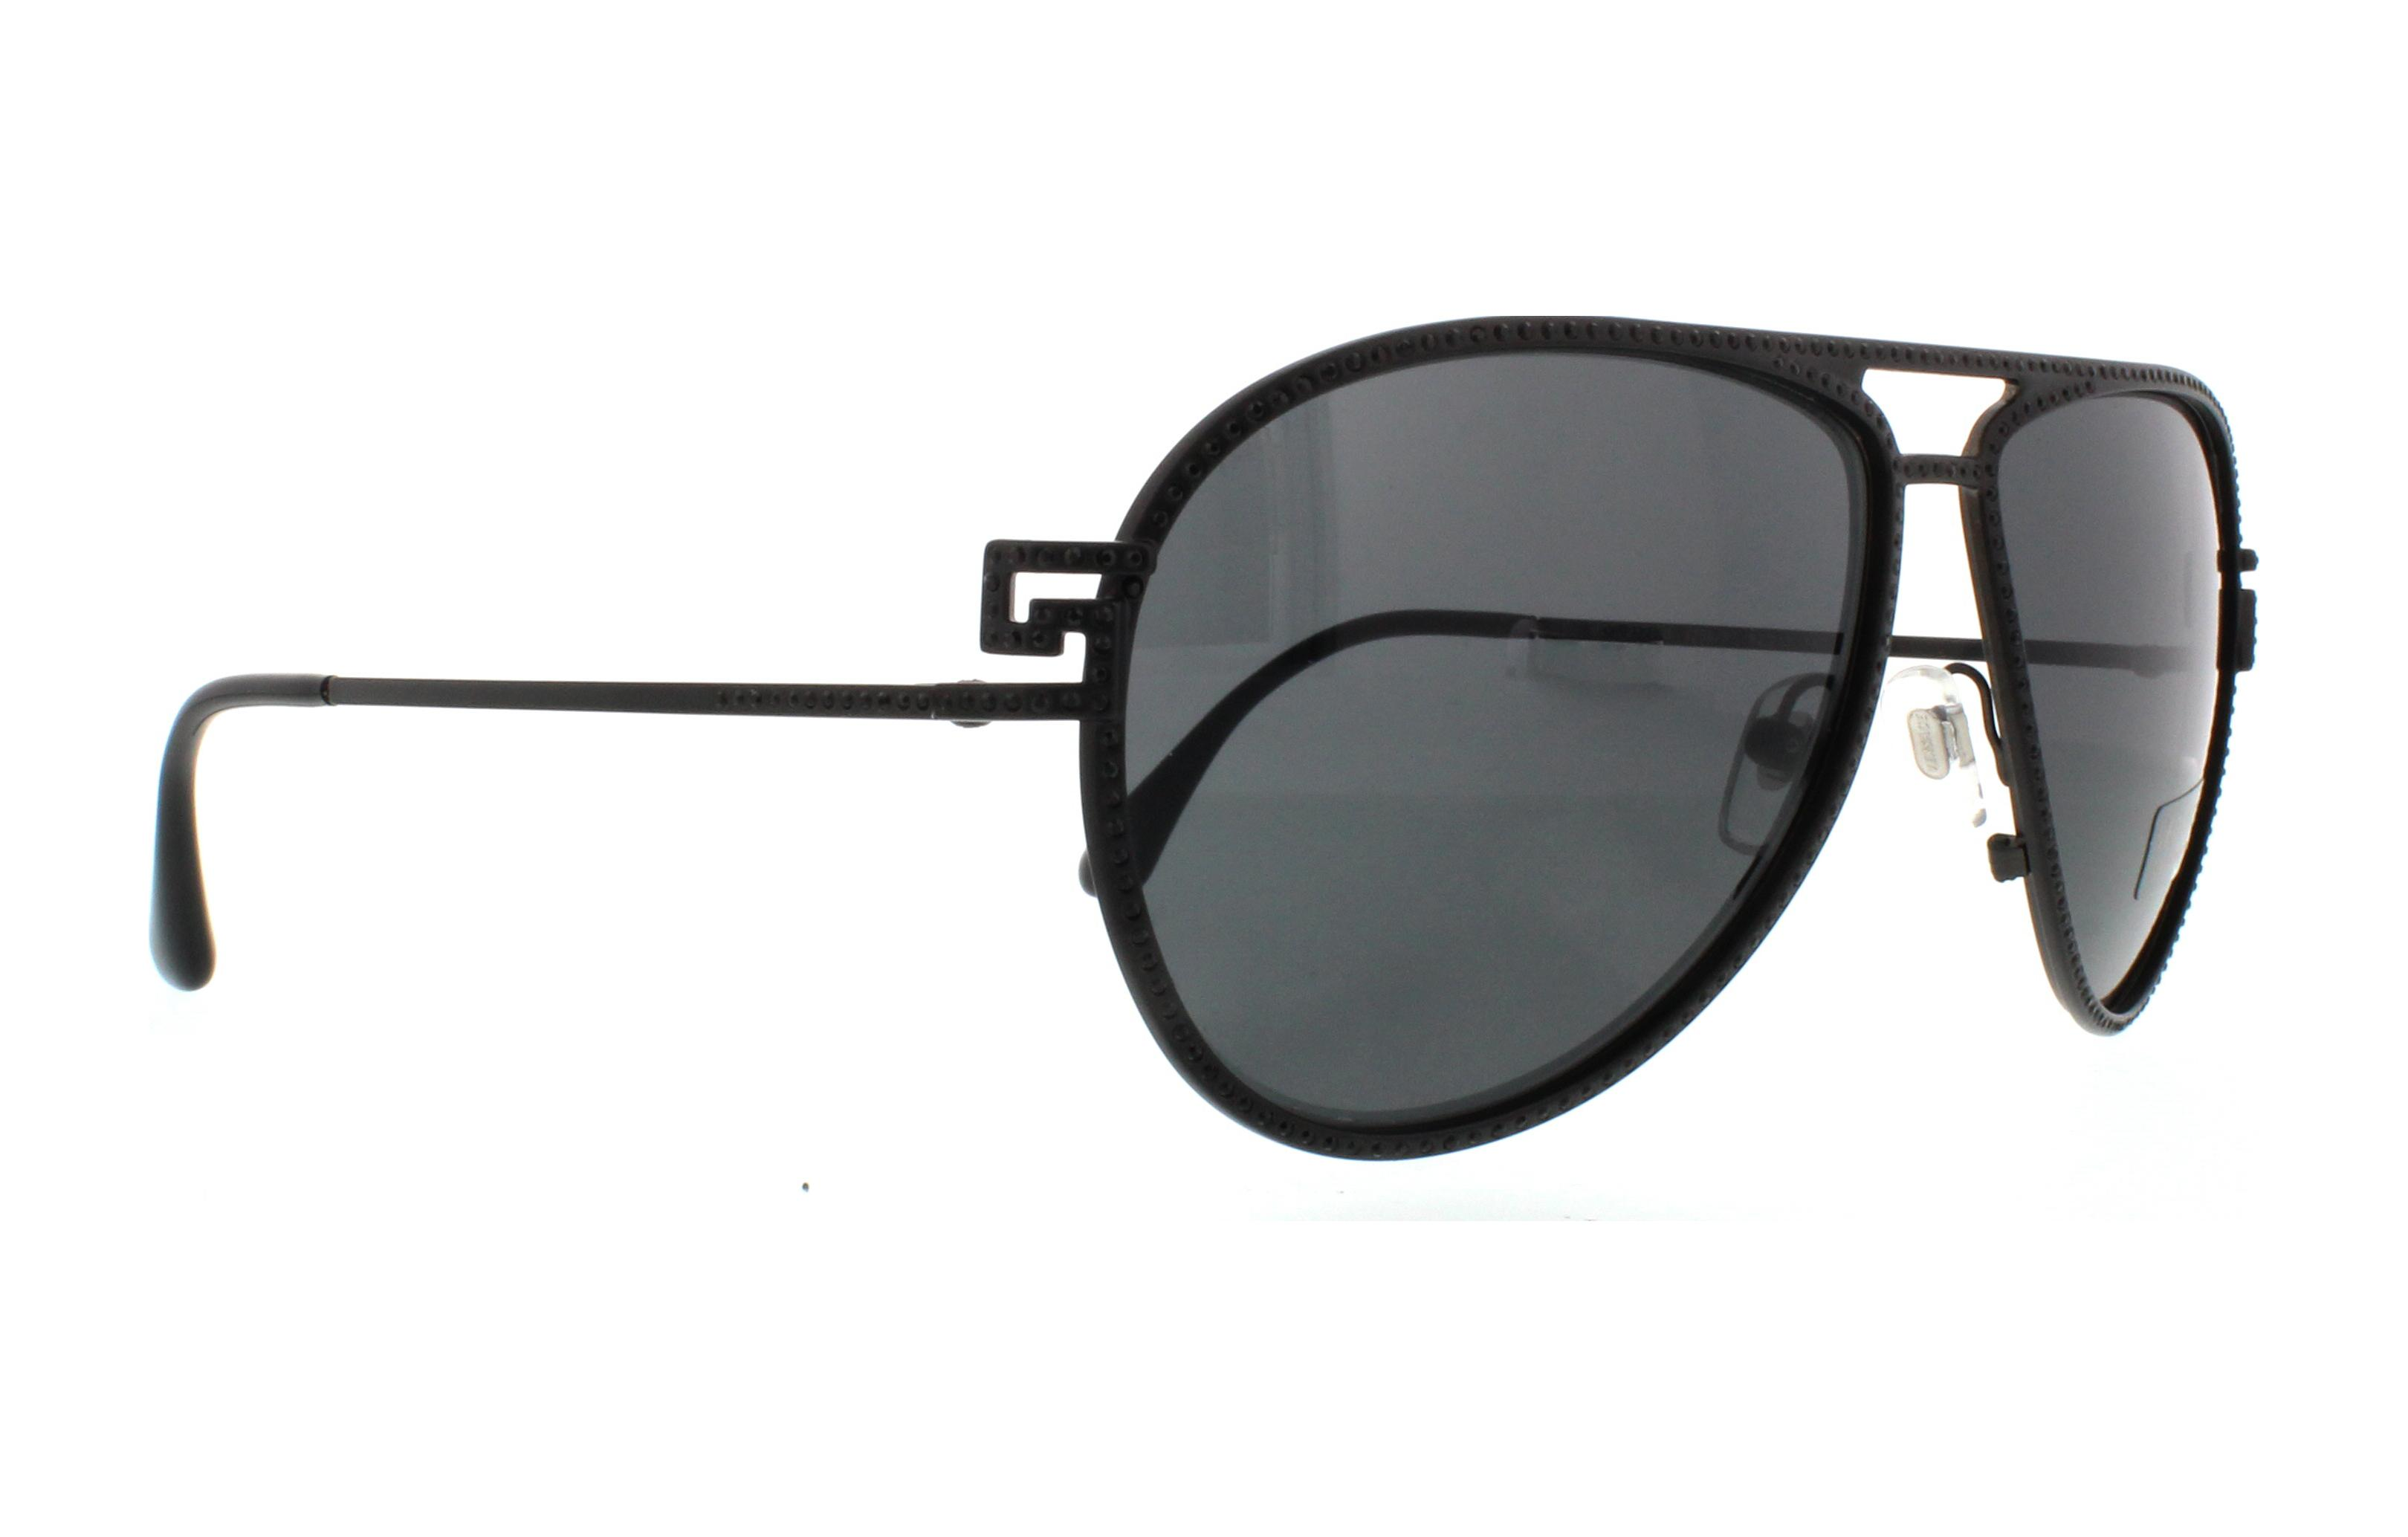 7b2f549e3a NWT Versace Sunglasses VE 2171B 1256  87 Matte Black    Grey 62 mm 125687  NIB Christmas gift